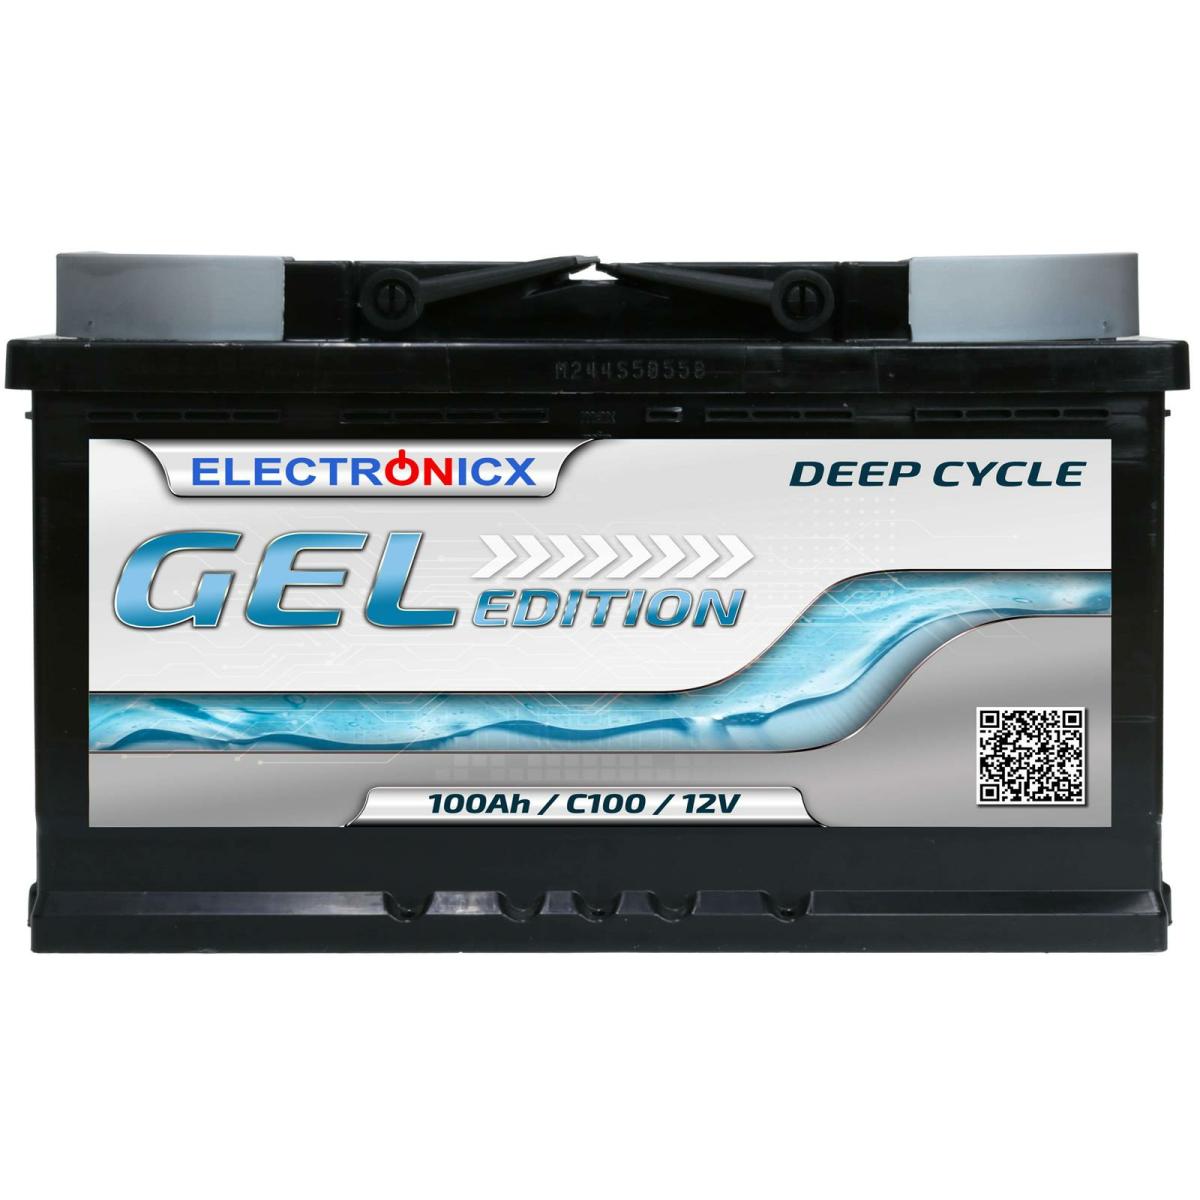 Electronicx Edition GEL Batterie 100 AH 12V  Versorgungsbatterie Freizeit Akku